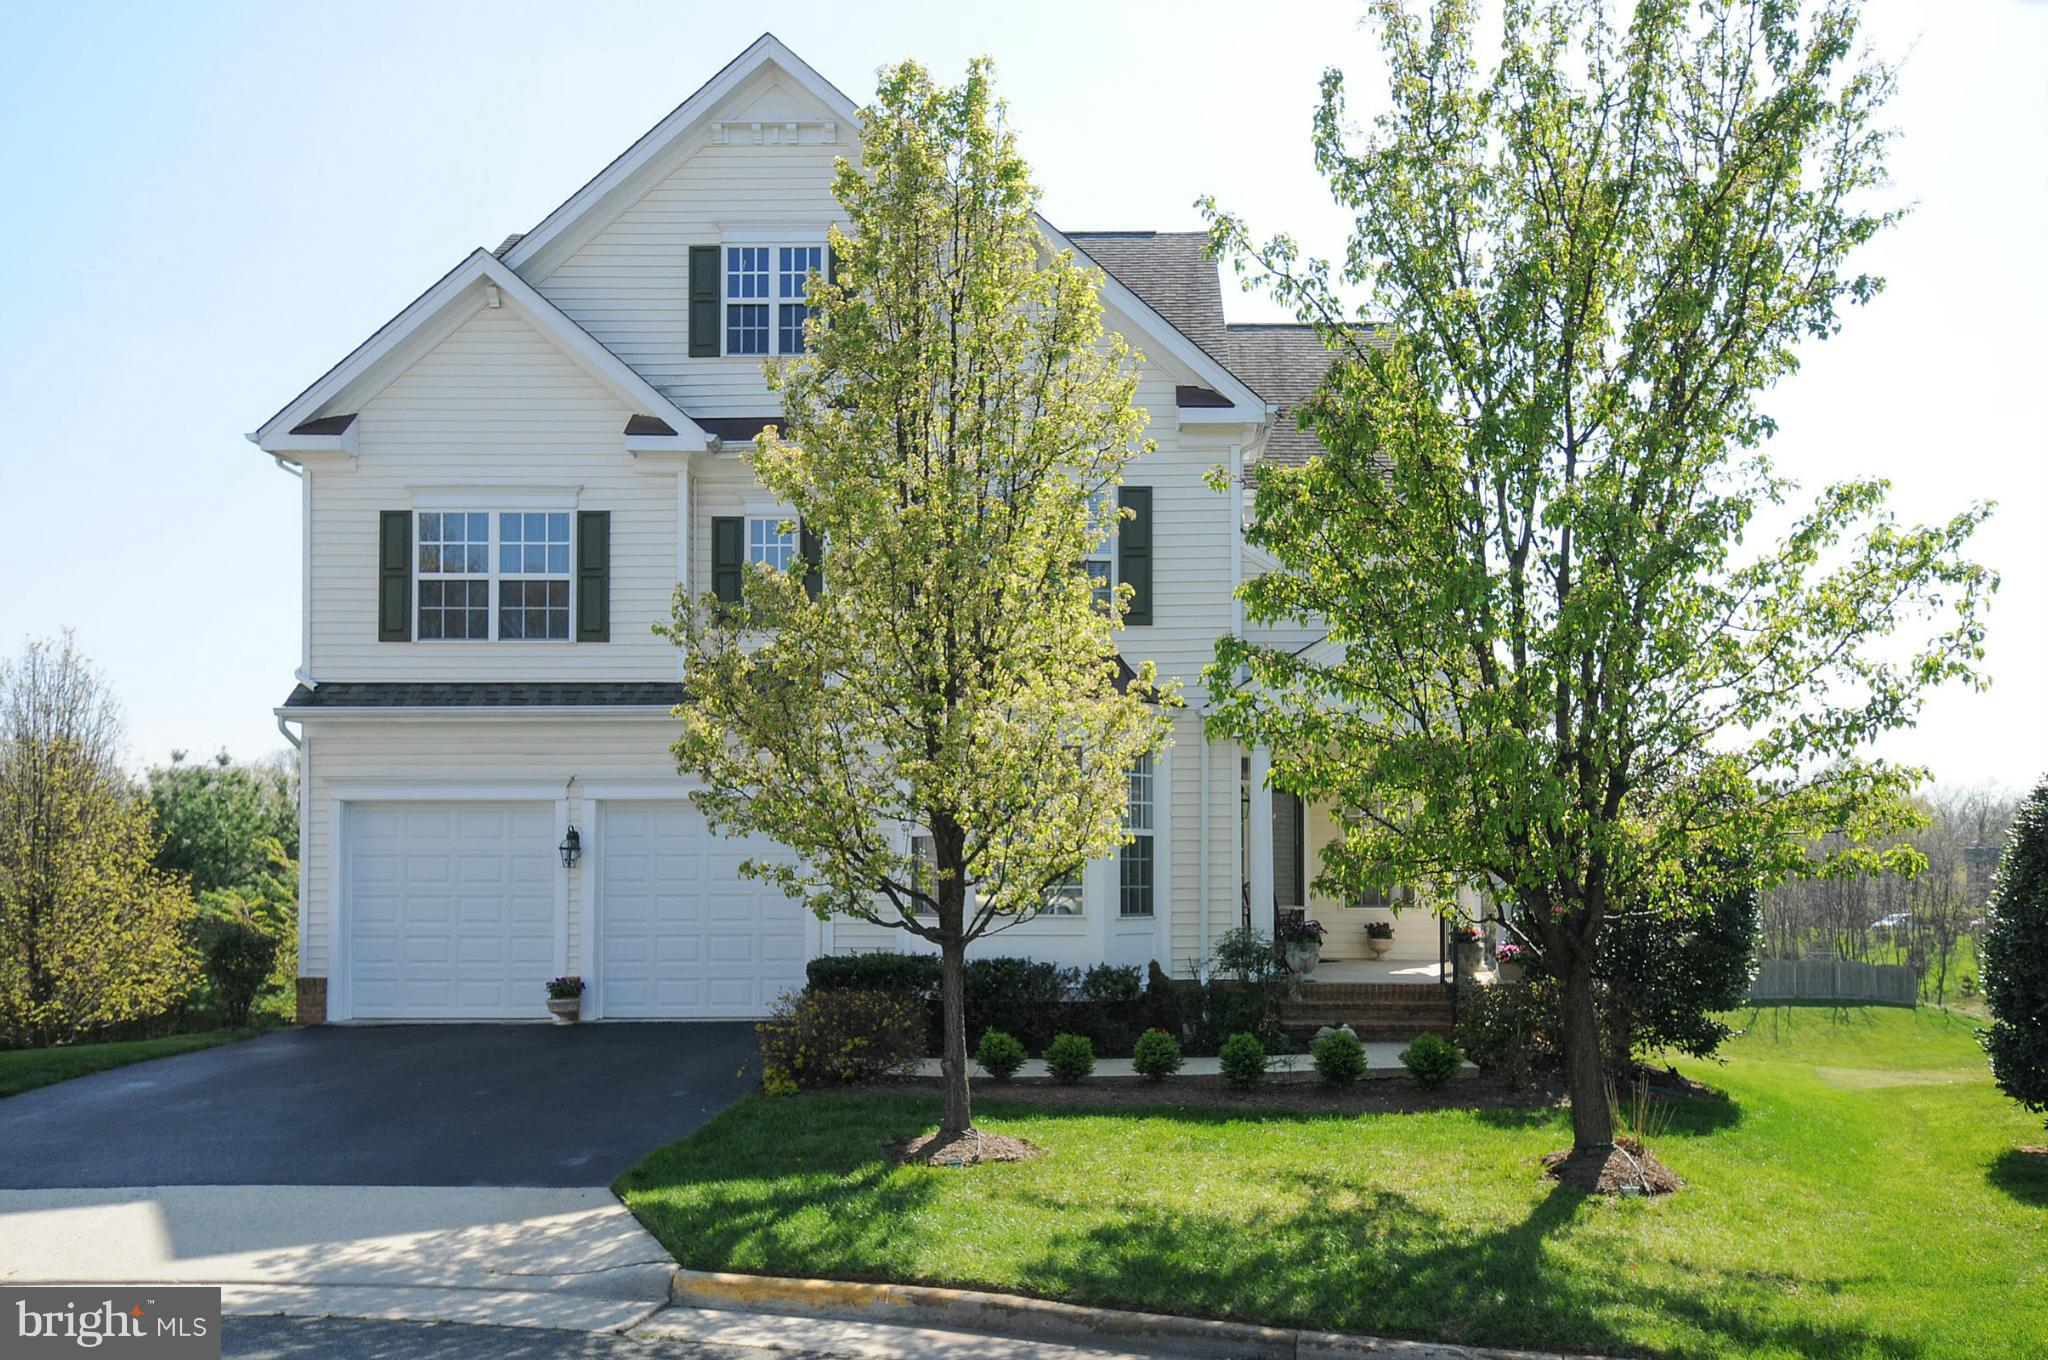 45805 Briar Oak Ln, Sterling, VA, 20164